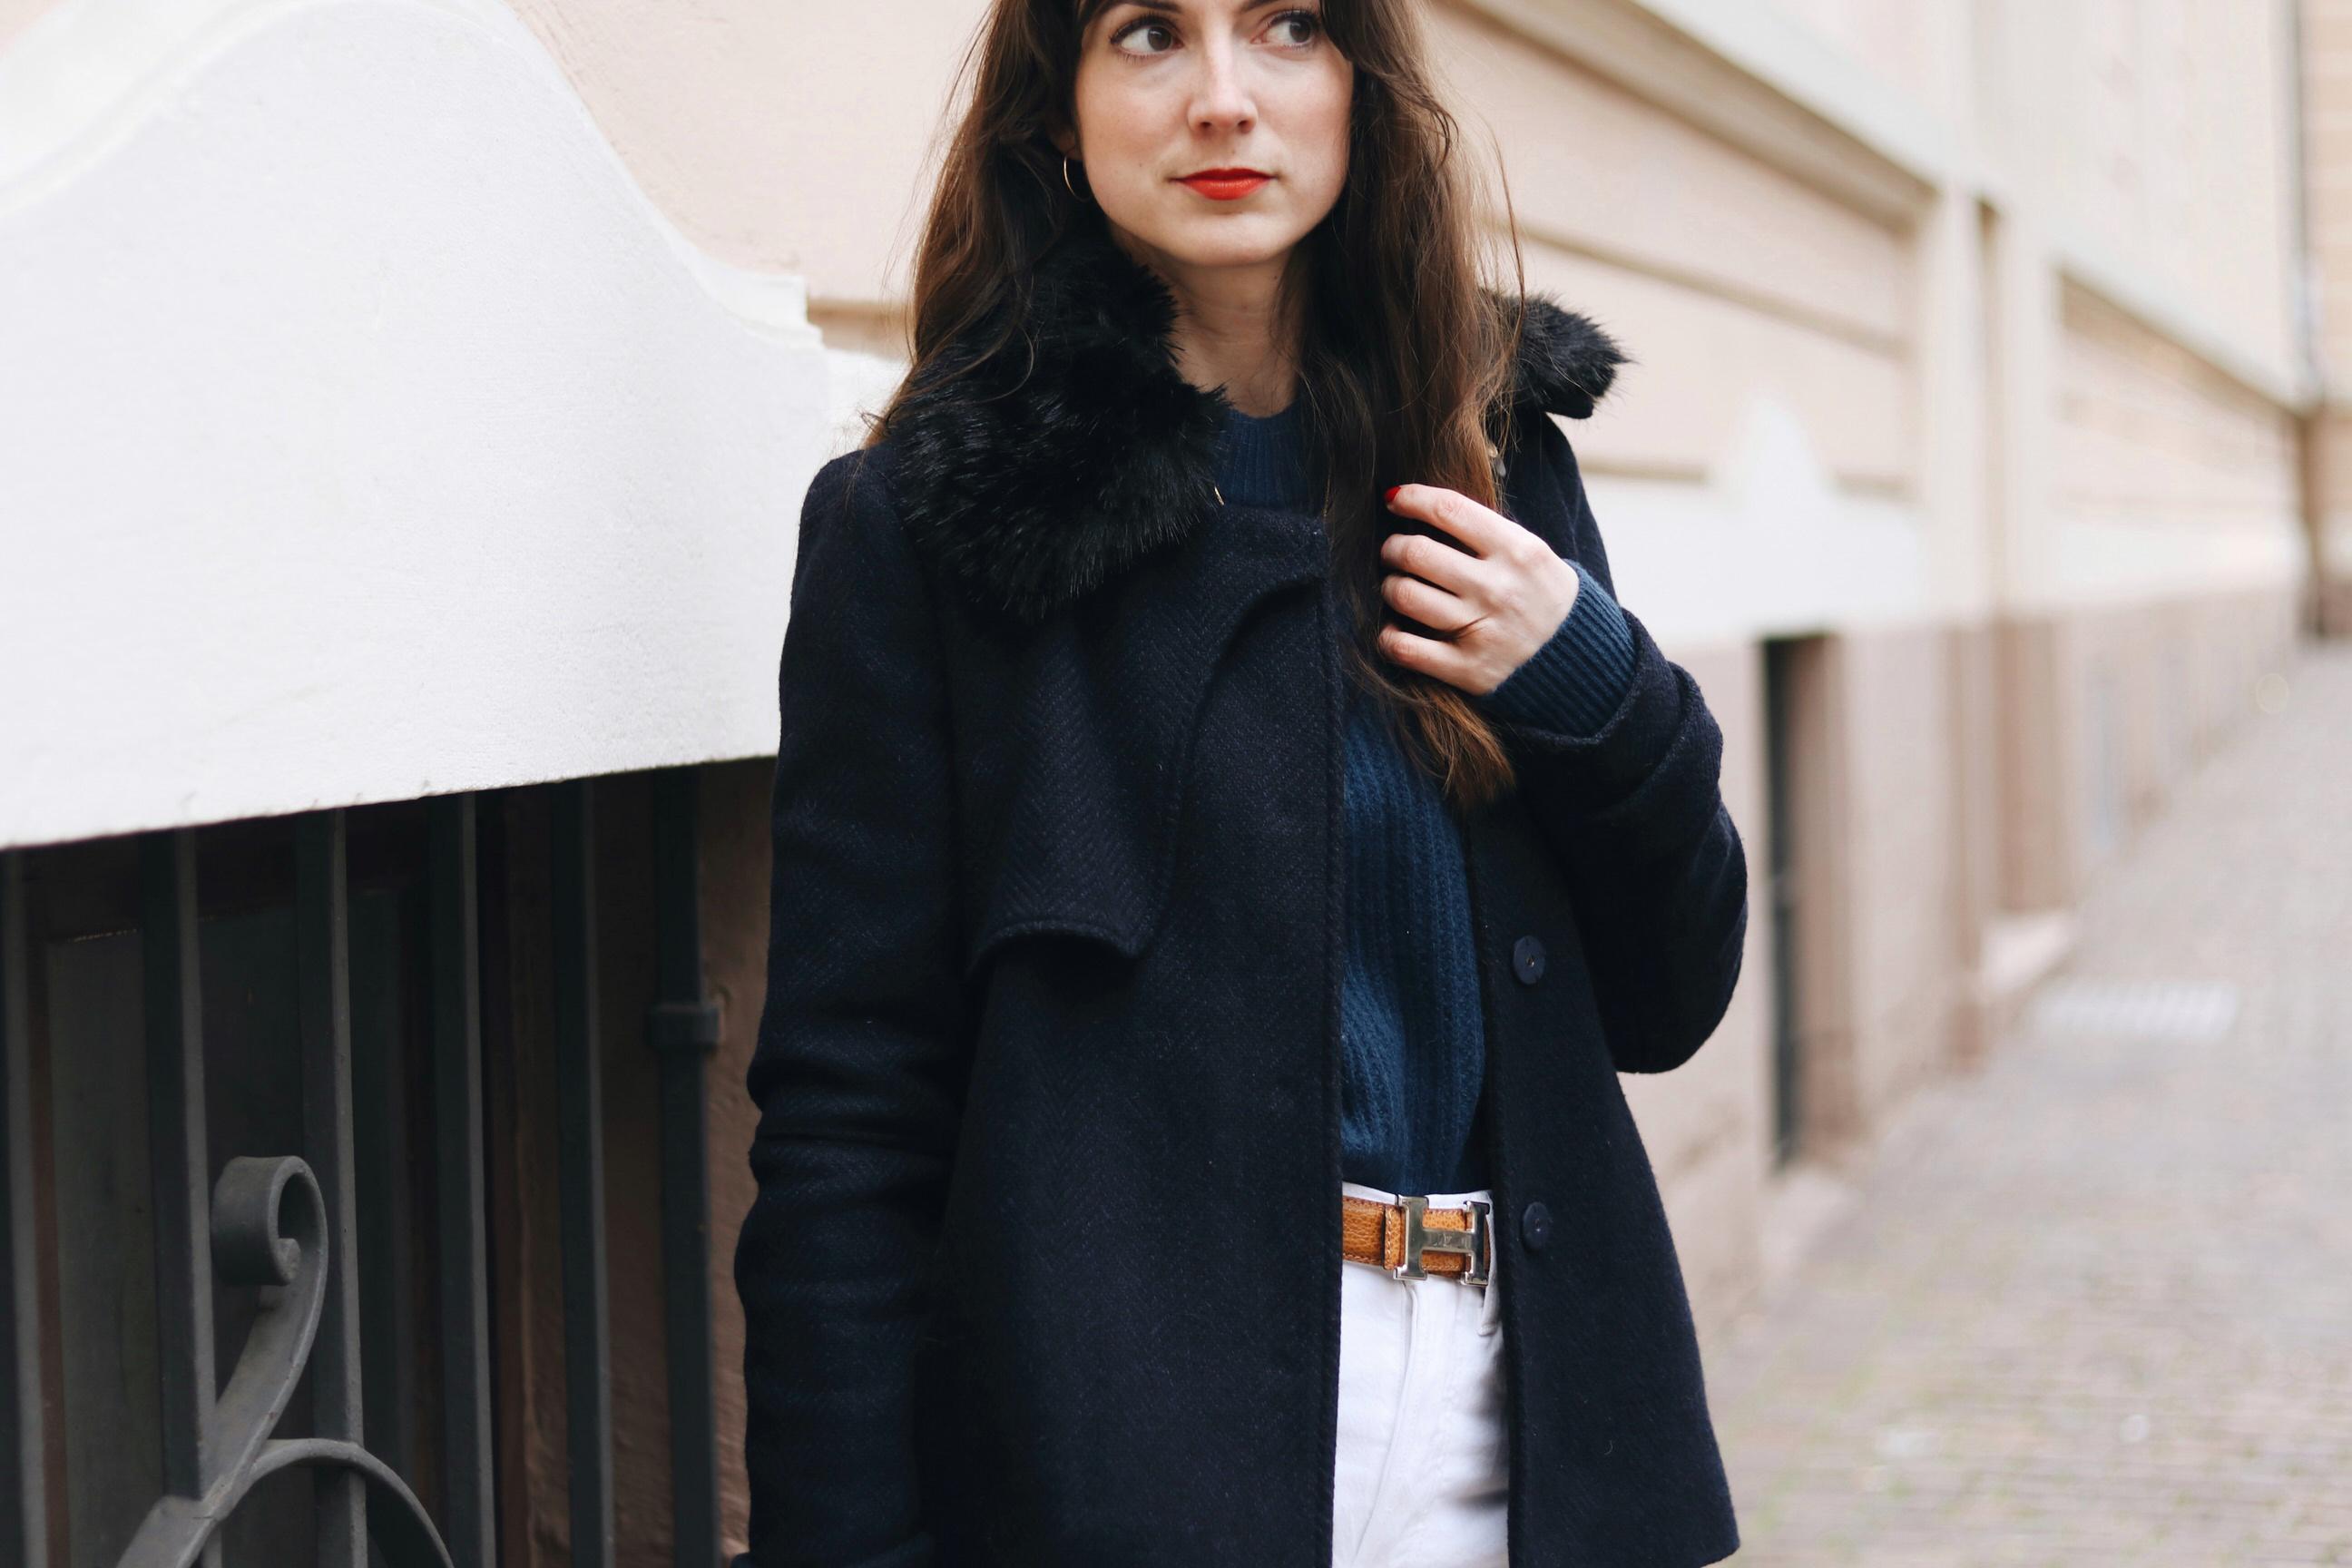 Winterjacke Caban Jacke blau kombinieren kaufen Damen blog Modeblog Bloggerin streetstyle